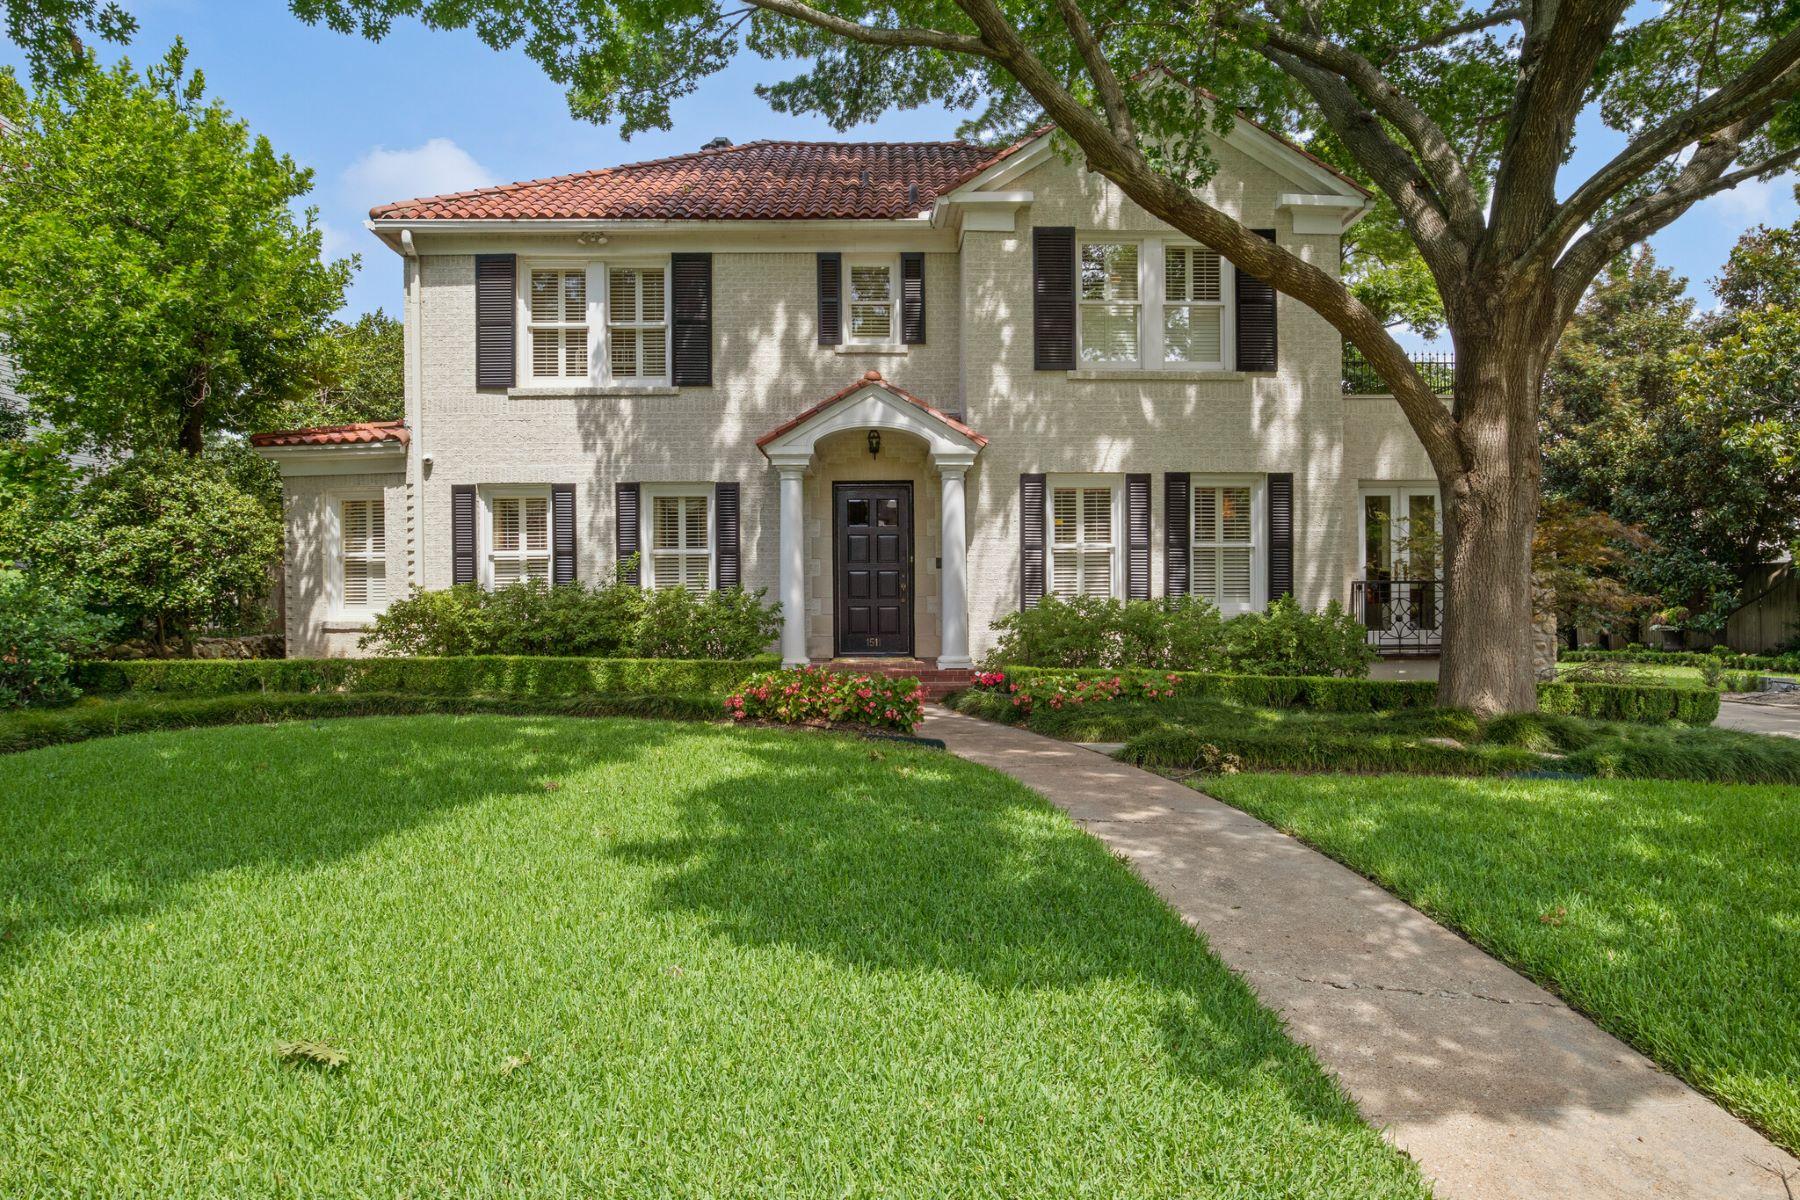 Single Family Homes for Sale at 1511 Washington Terrace, Fort Worth, TX, 76107 1511 Washington Terrace Fort Worth, Texas 76107 United States